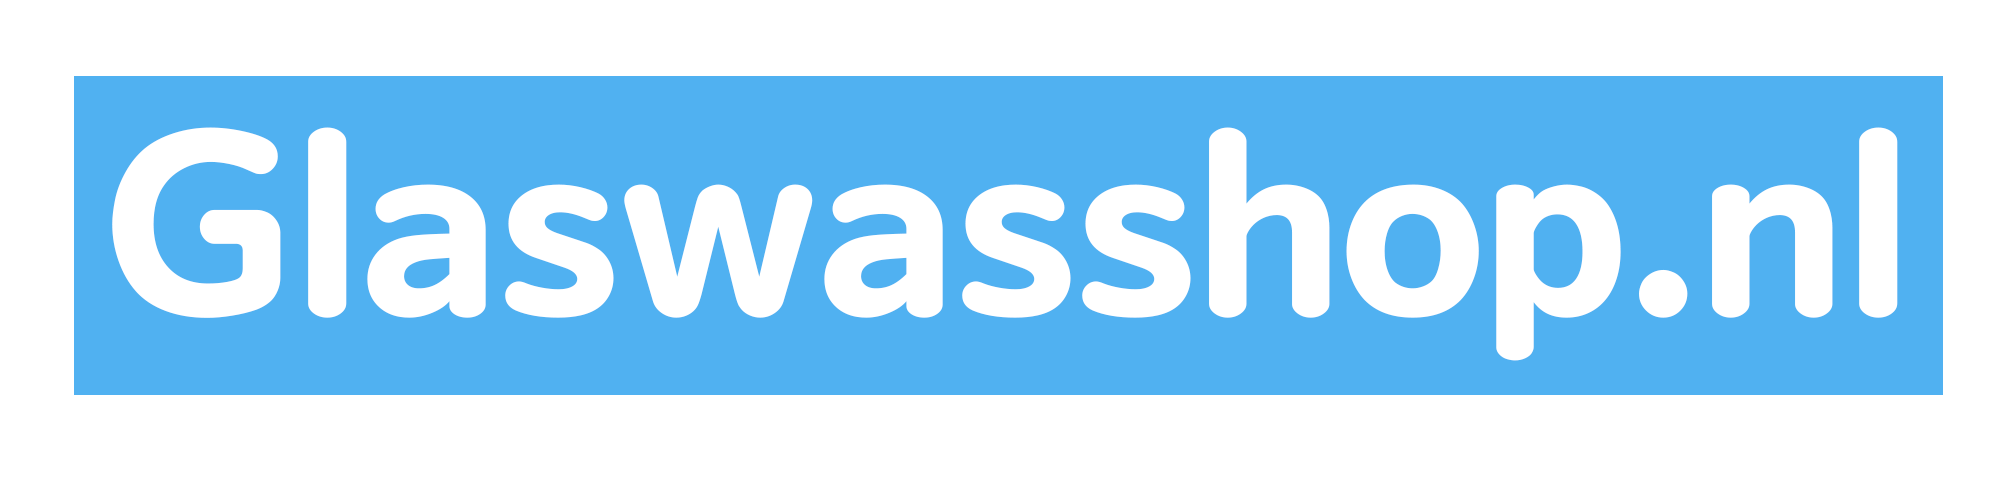 Glaswasshop.nl